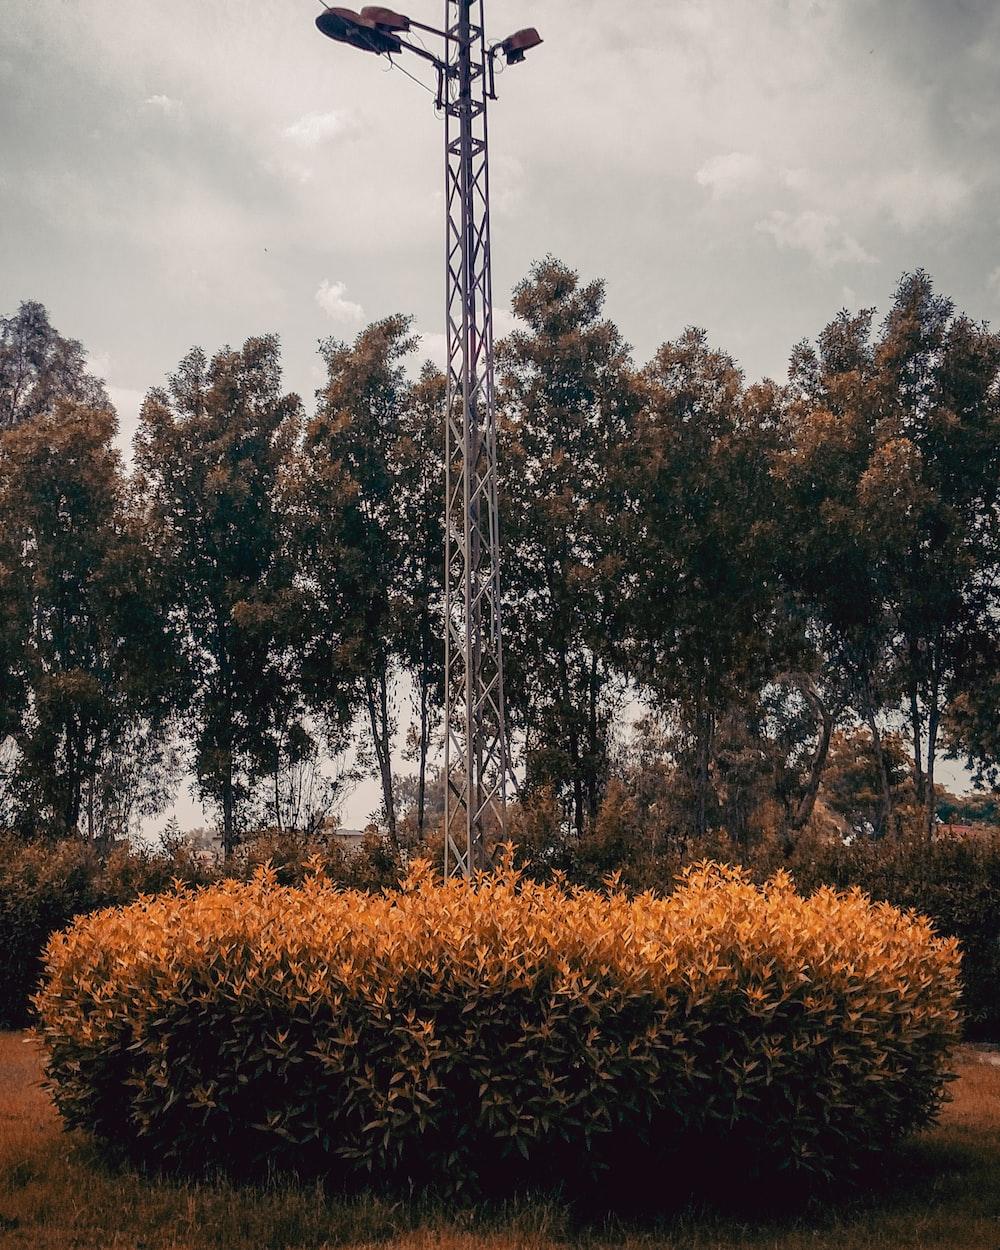 trees near tower